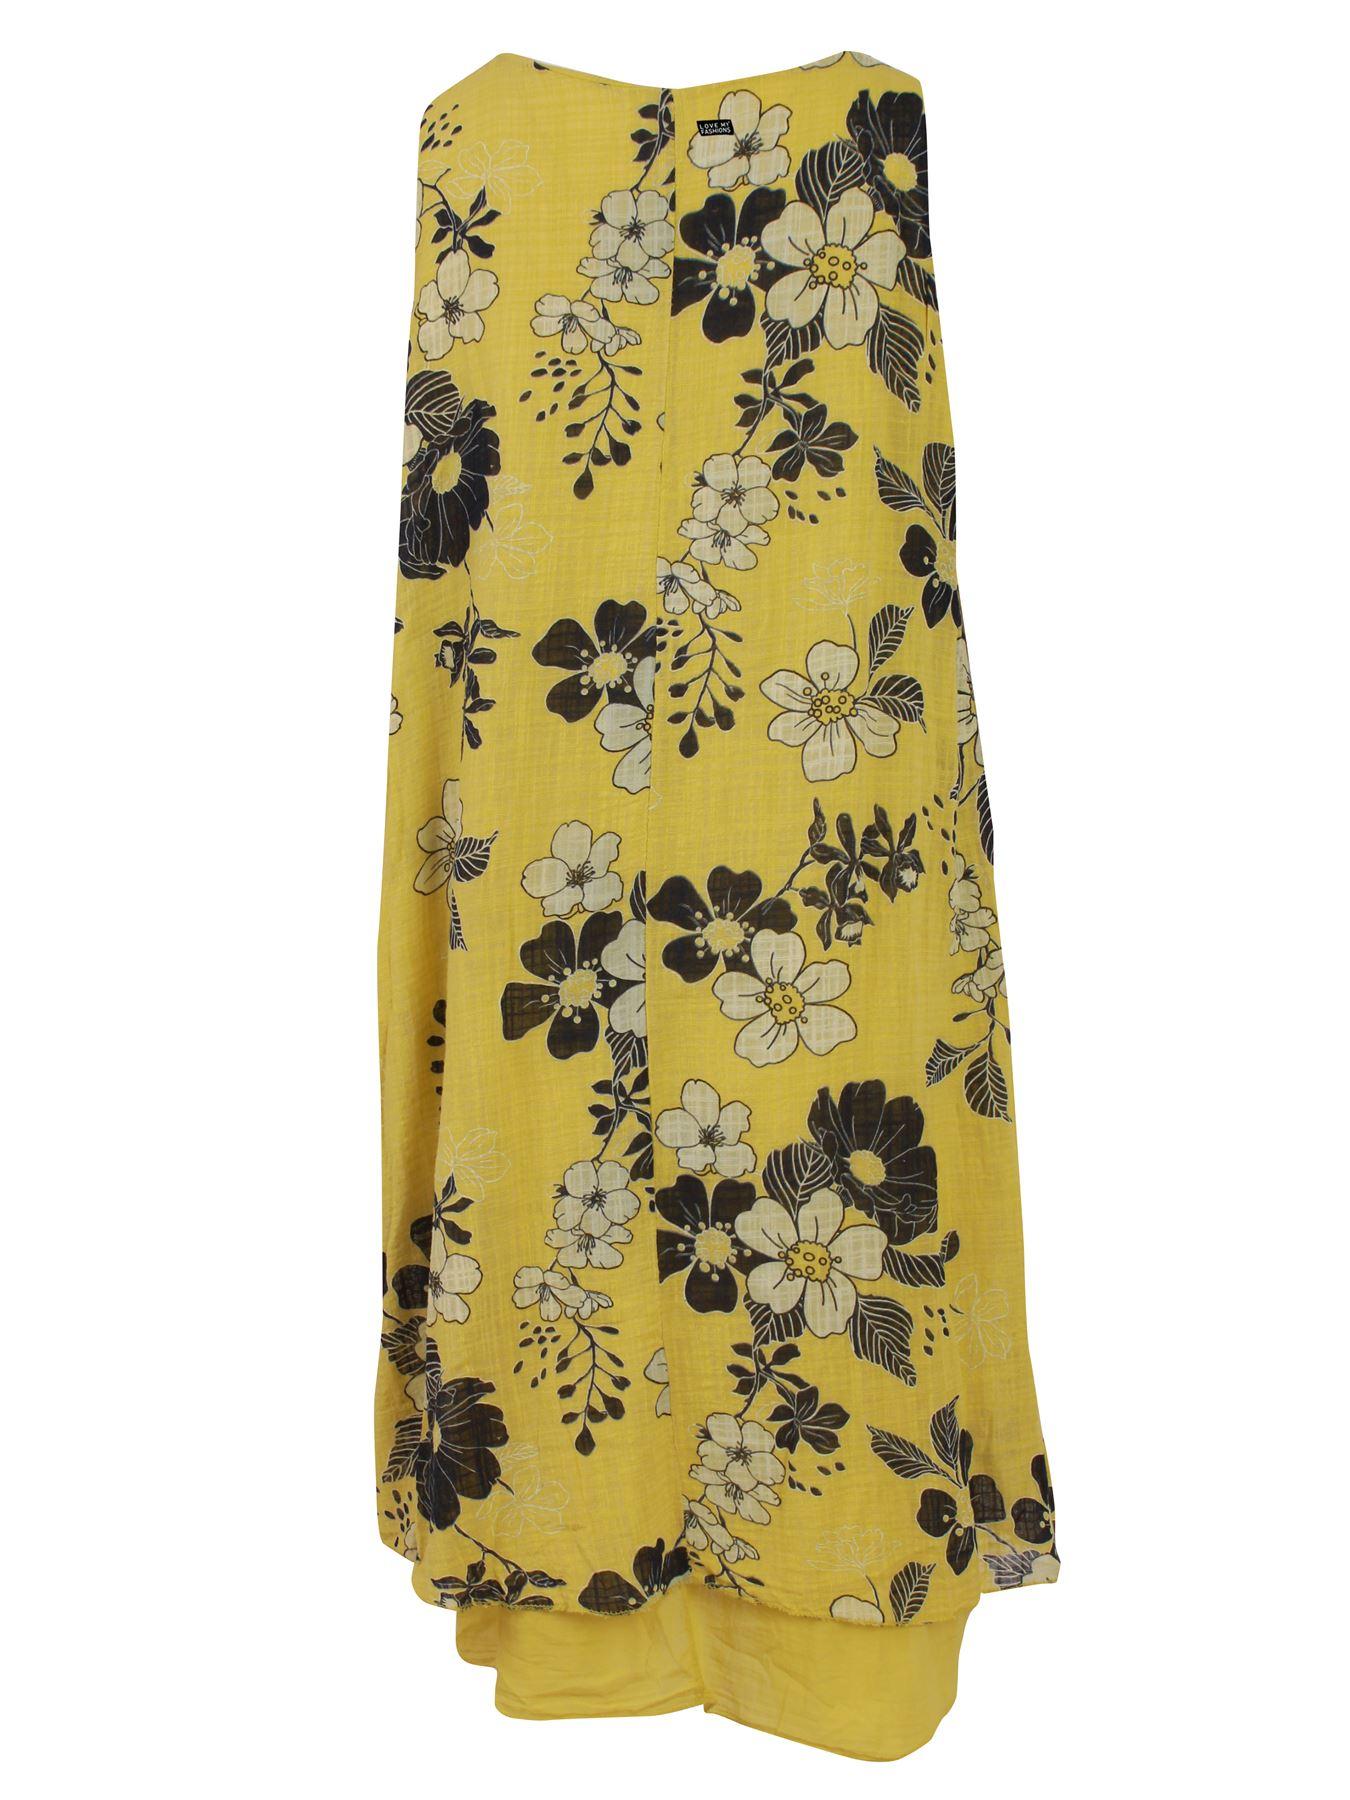 Womens-Floral-Print-Italian-Fashion-Lagenlook-Summer-Cotton-Crew-Neck-Dress thumbnail 3